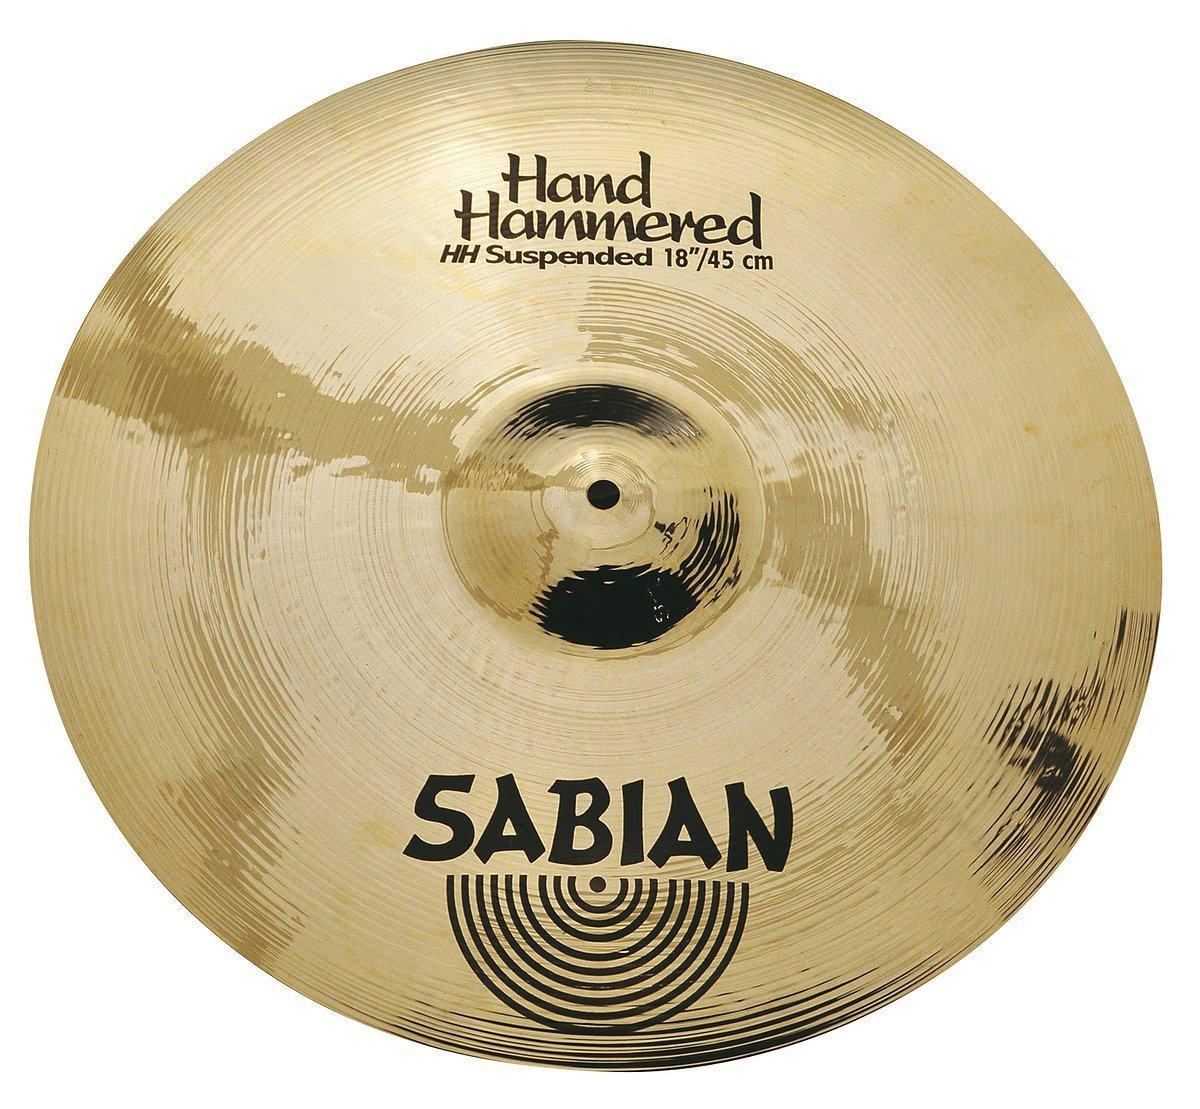 Sabian 19'' HH Suspended, Brass, inch (11923)